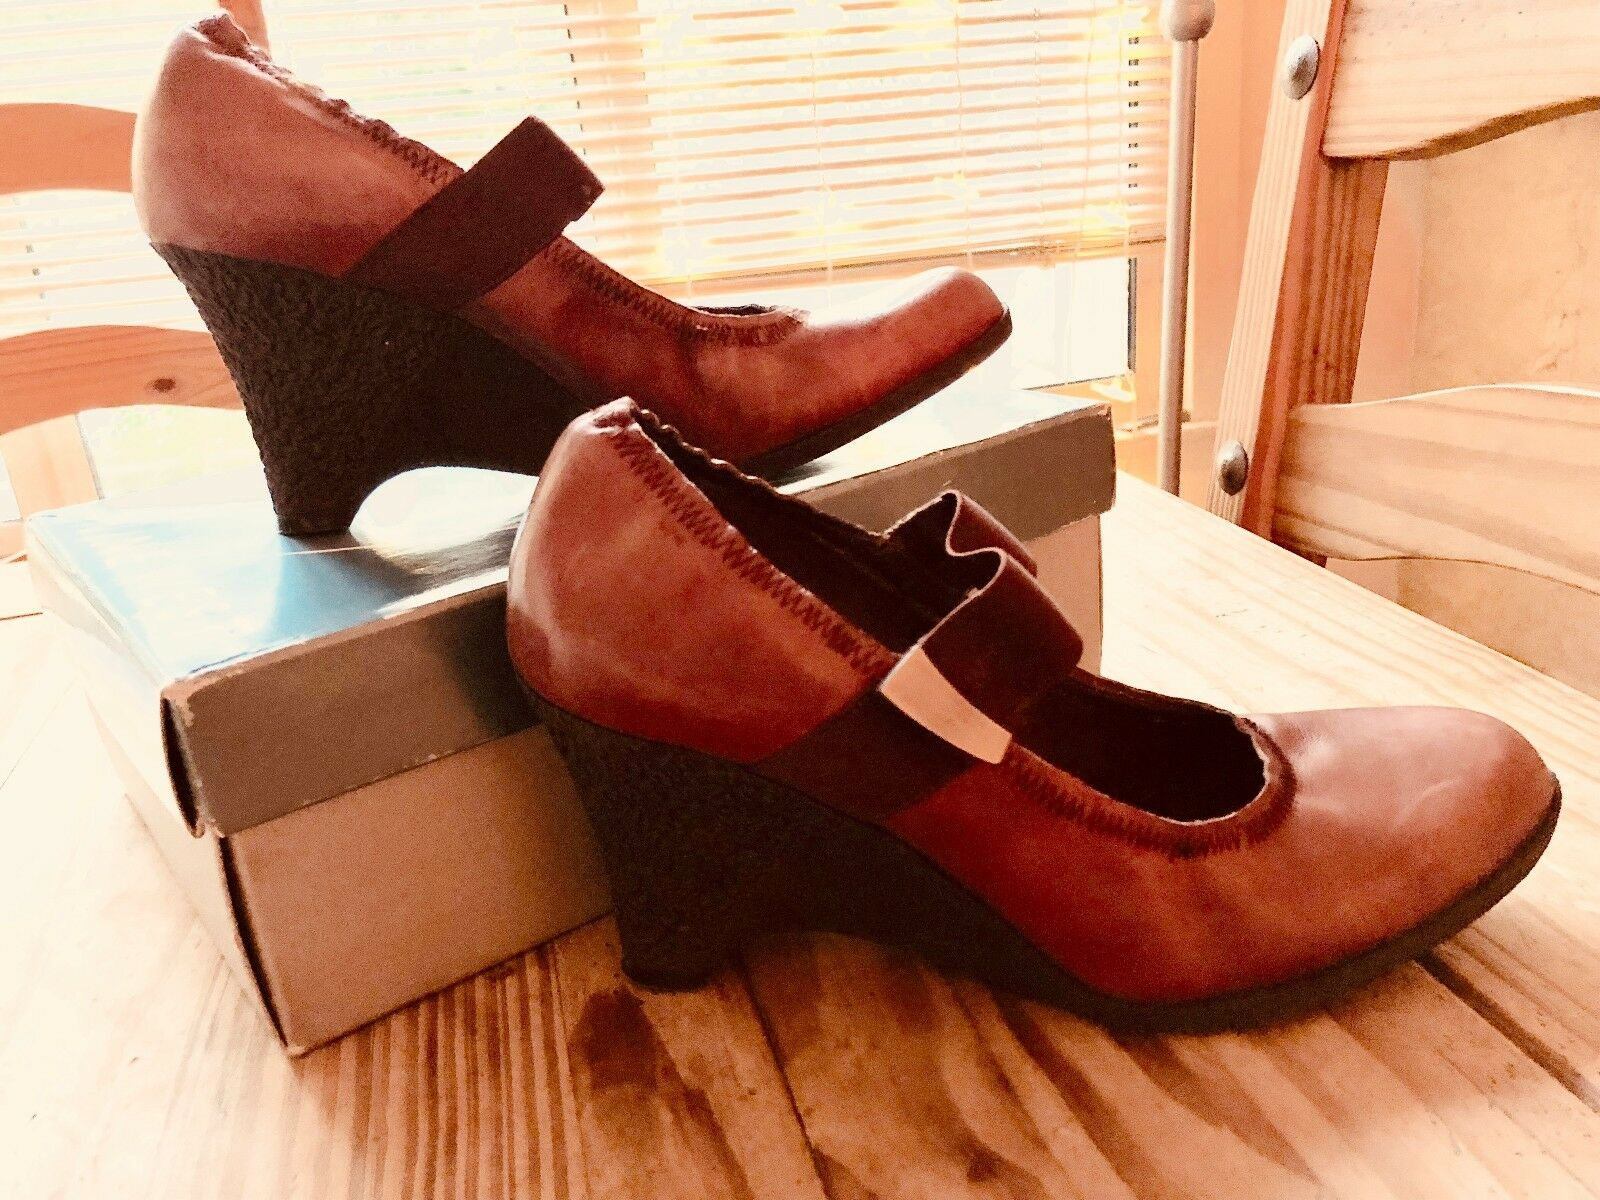 NINE WEST Schuhe • Alexandrin • Leder • Tan • Elastic • Wedge • Damenschuhe Größe 7.5